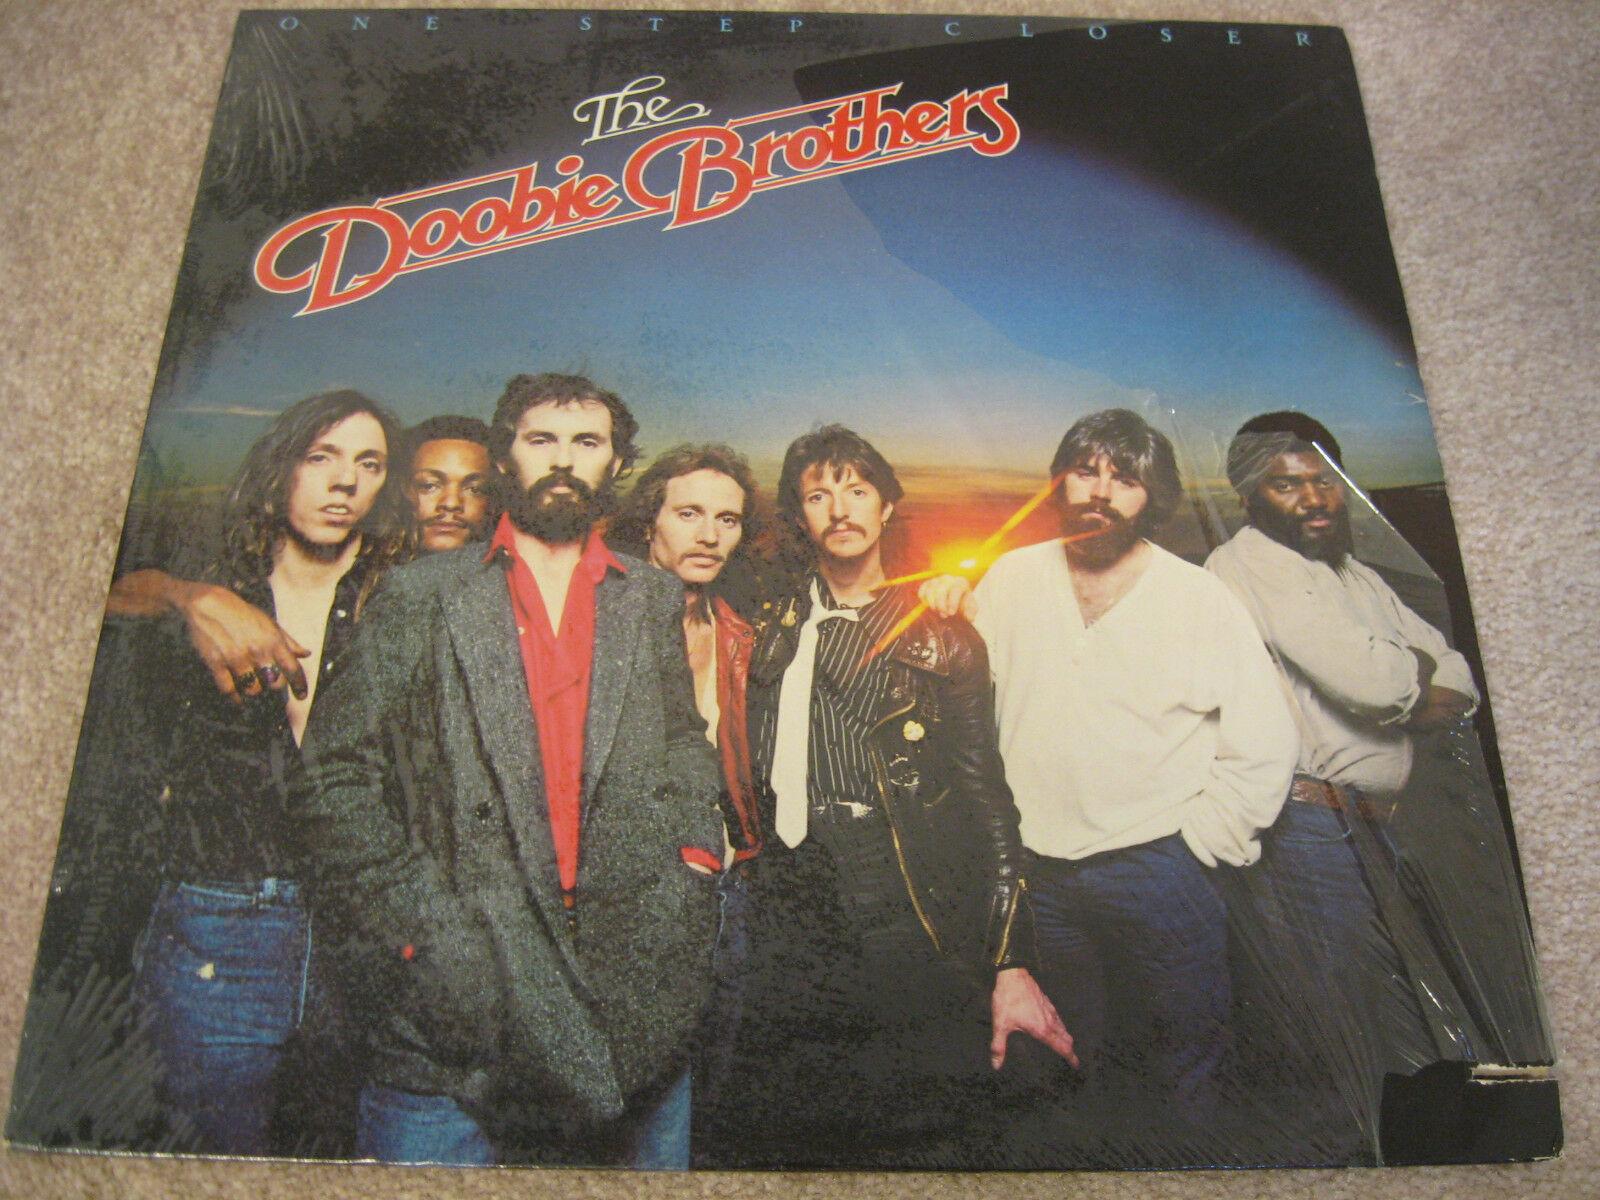 The Doobie Brothers One Step Closer Warner Bros HS3452 Stereo Vinyl LP